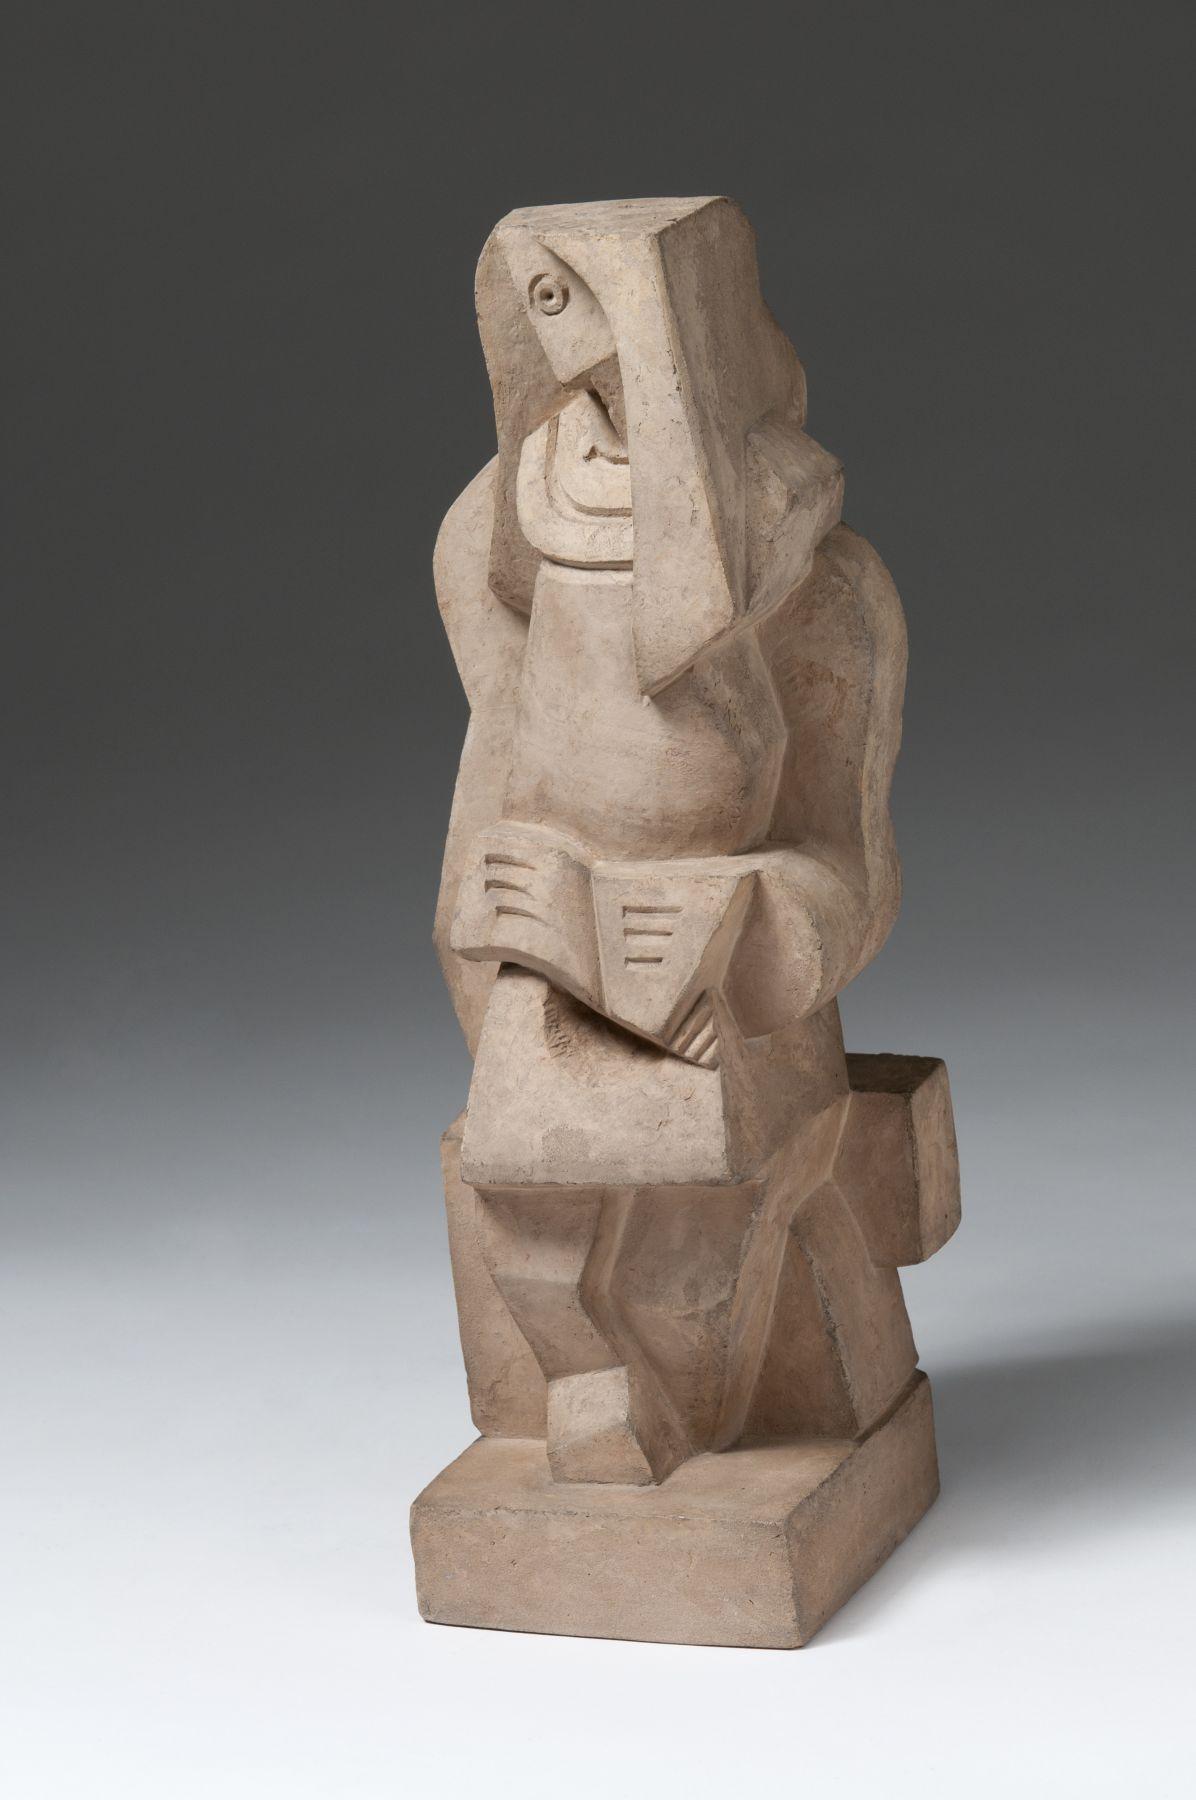 Jacques Lipchitz, Liseuse (Woman Reading), 1919, cast terracotta, 15 3/8 h x 5 7/8 w x 4 5/8 d inches, Edition 6/7